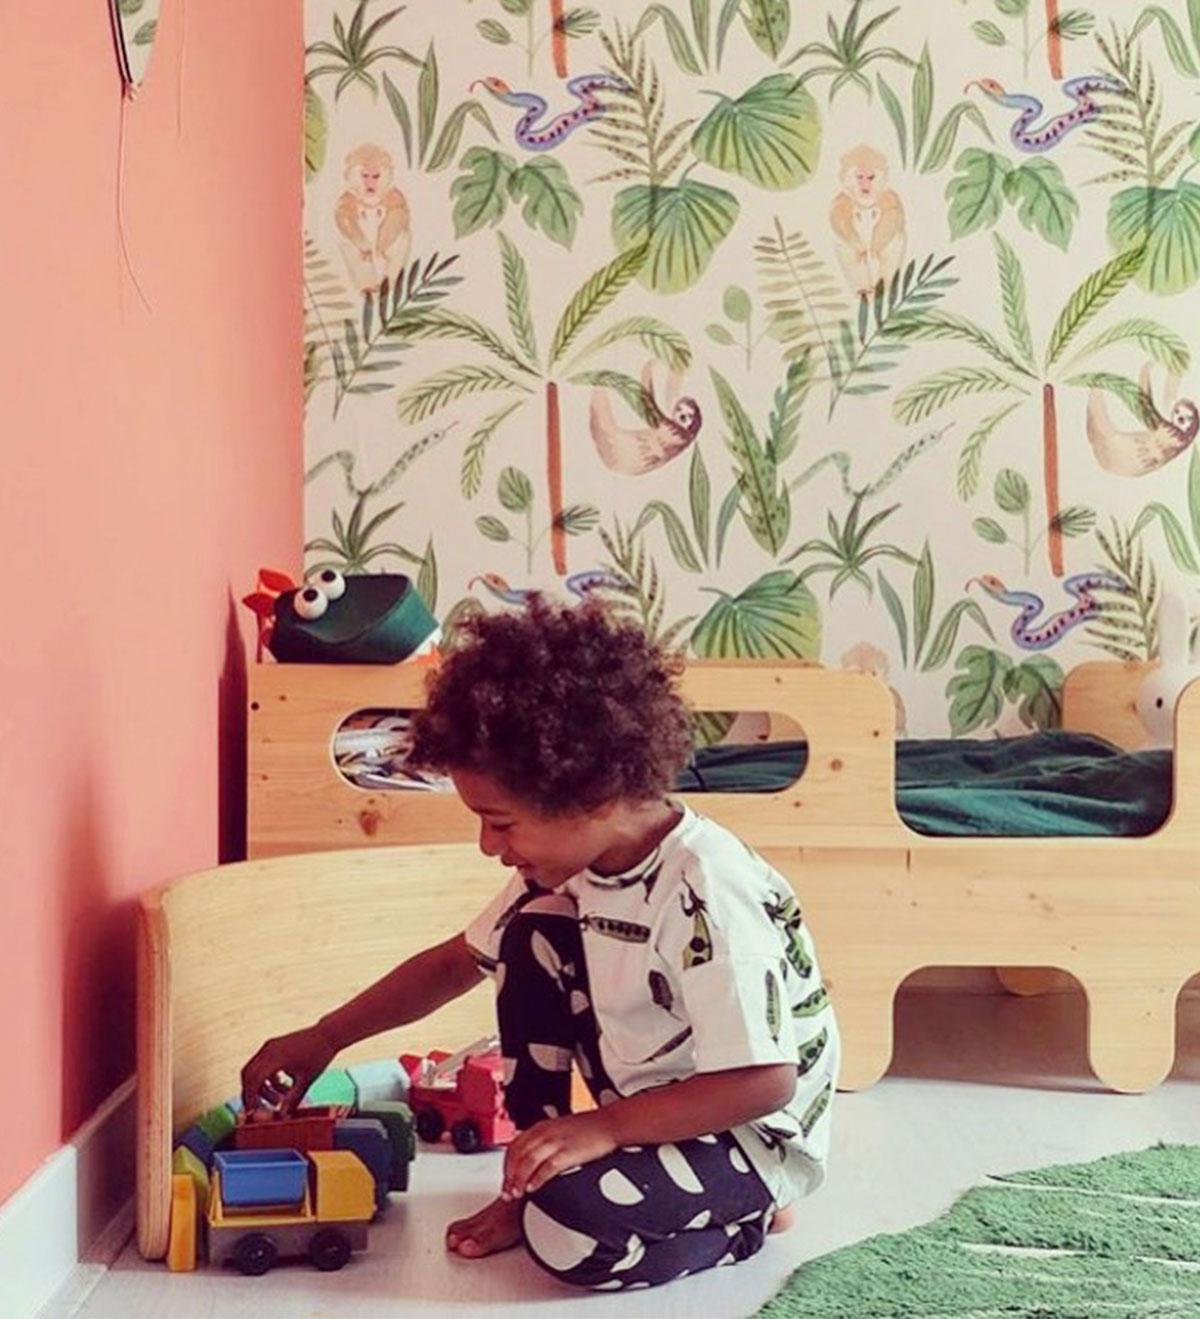 THE EDIT Toys That Teach